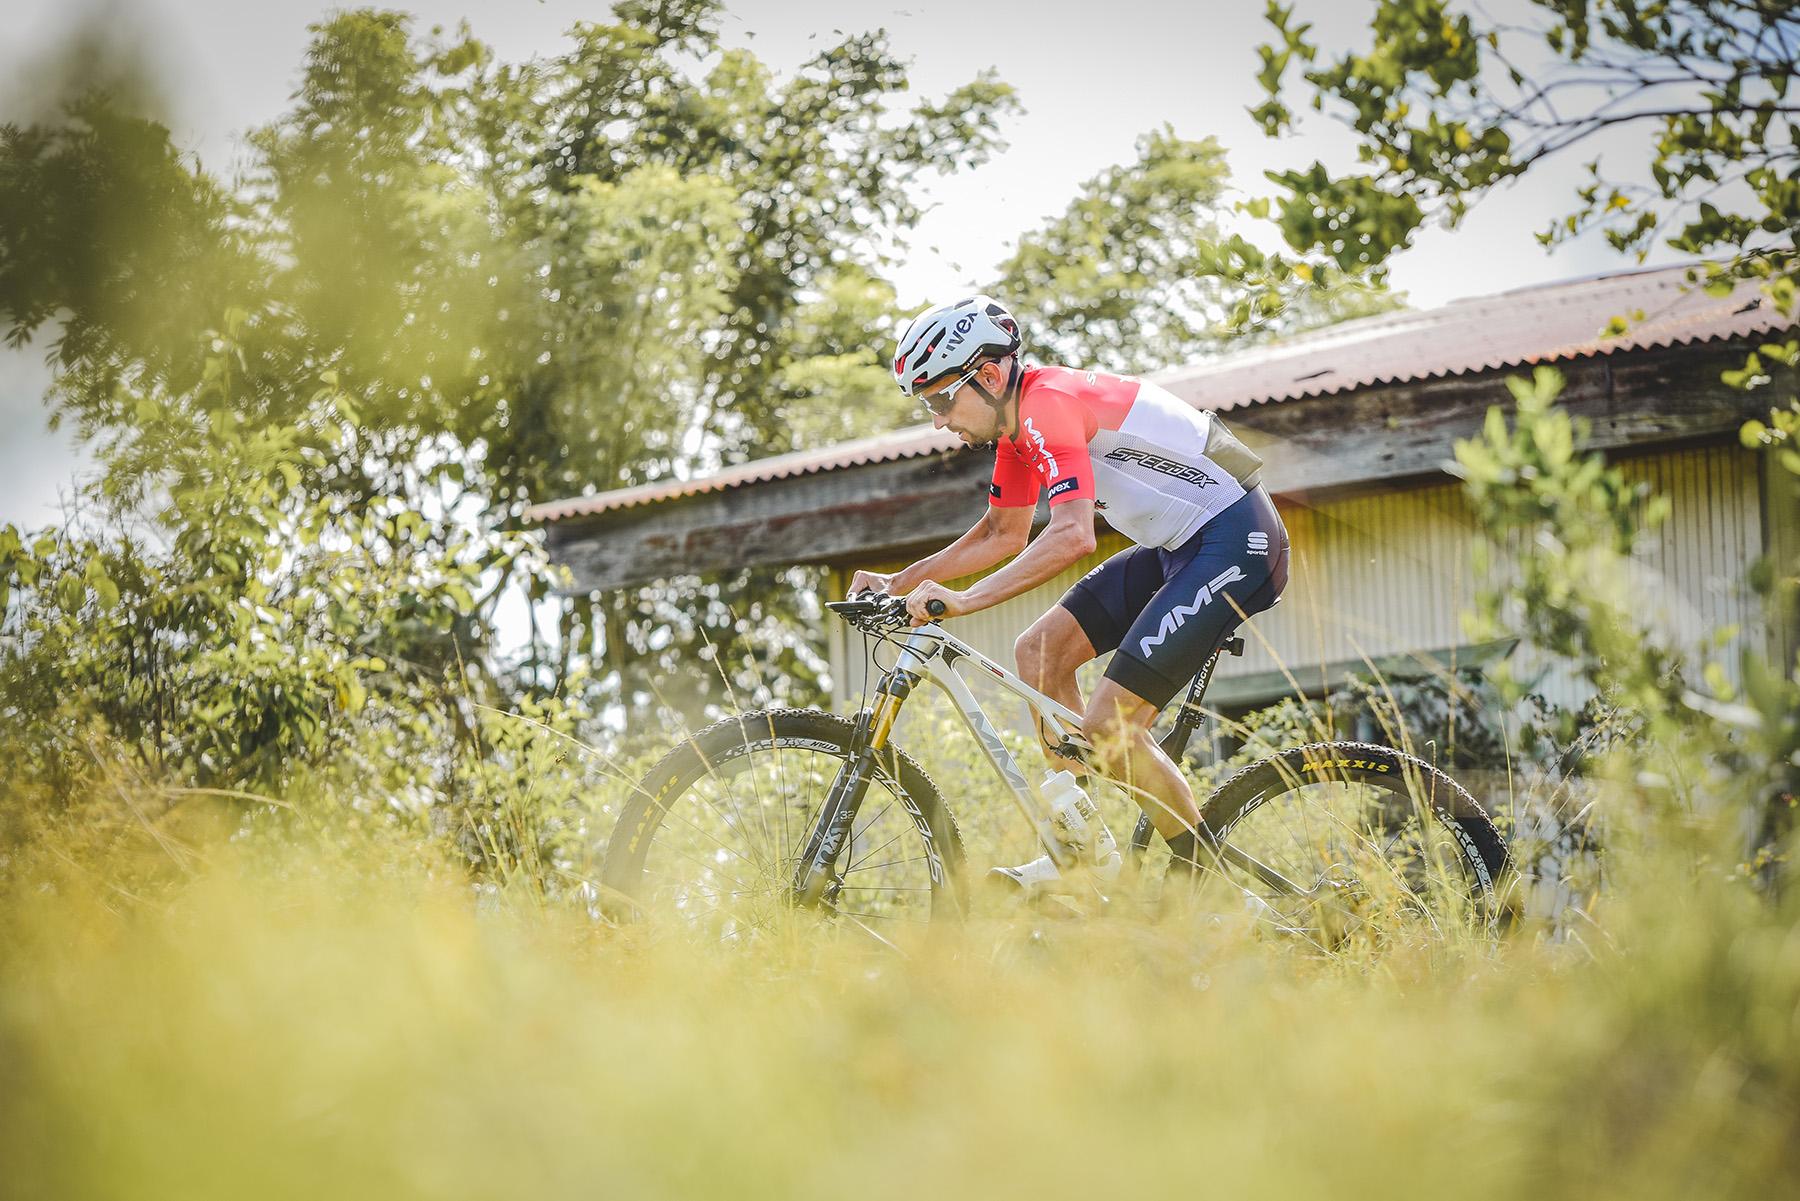 Proyecto innovador busca a un joven ciclista para patrocinarlo